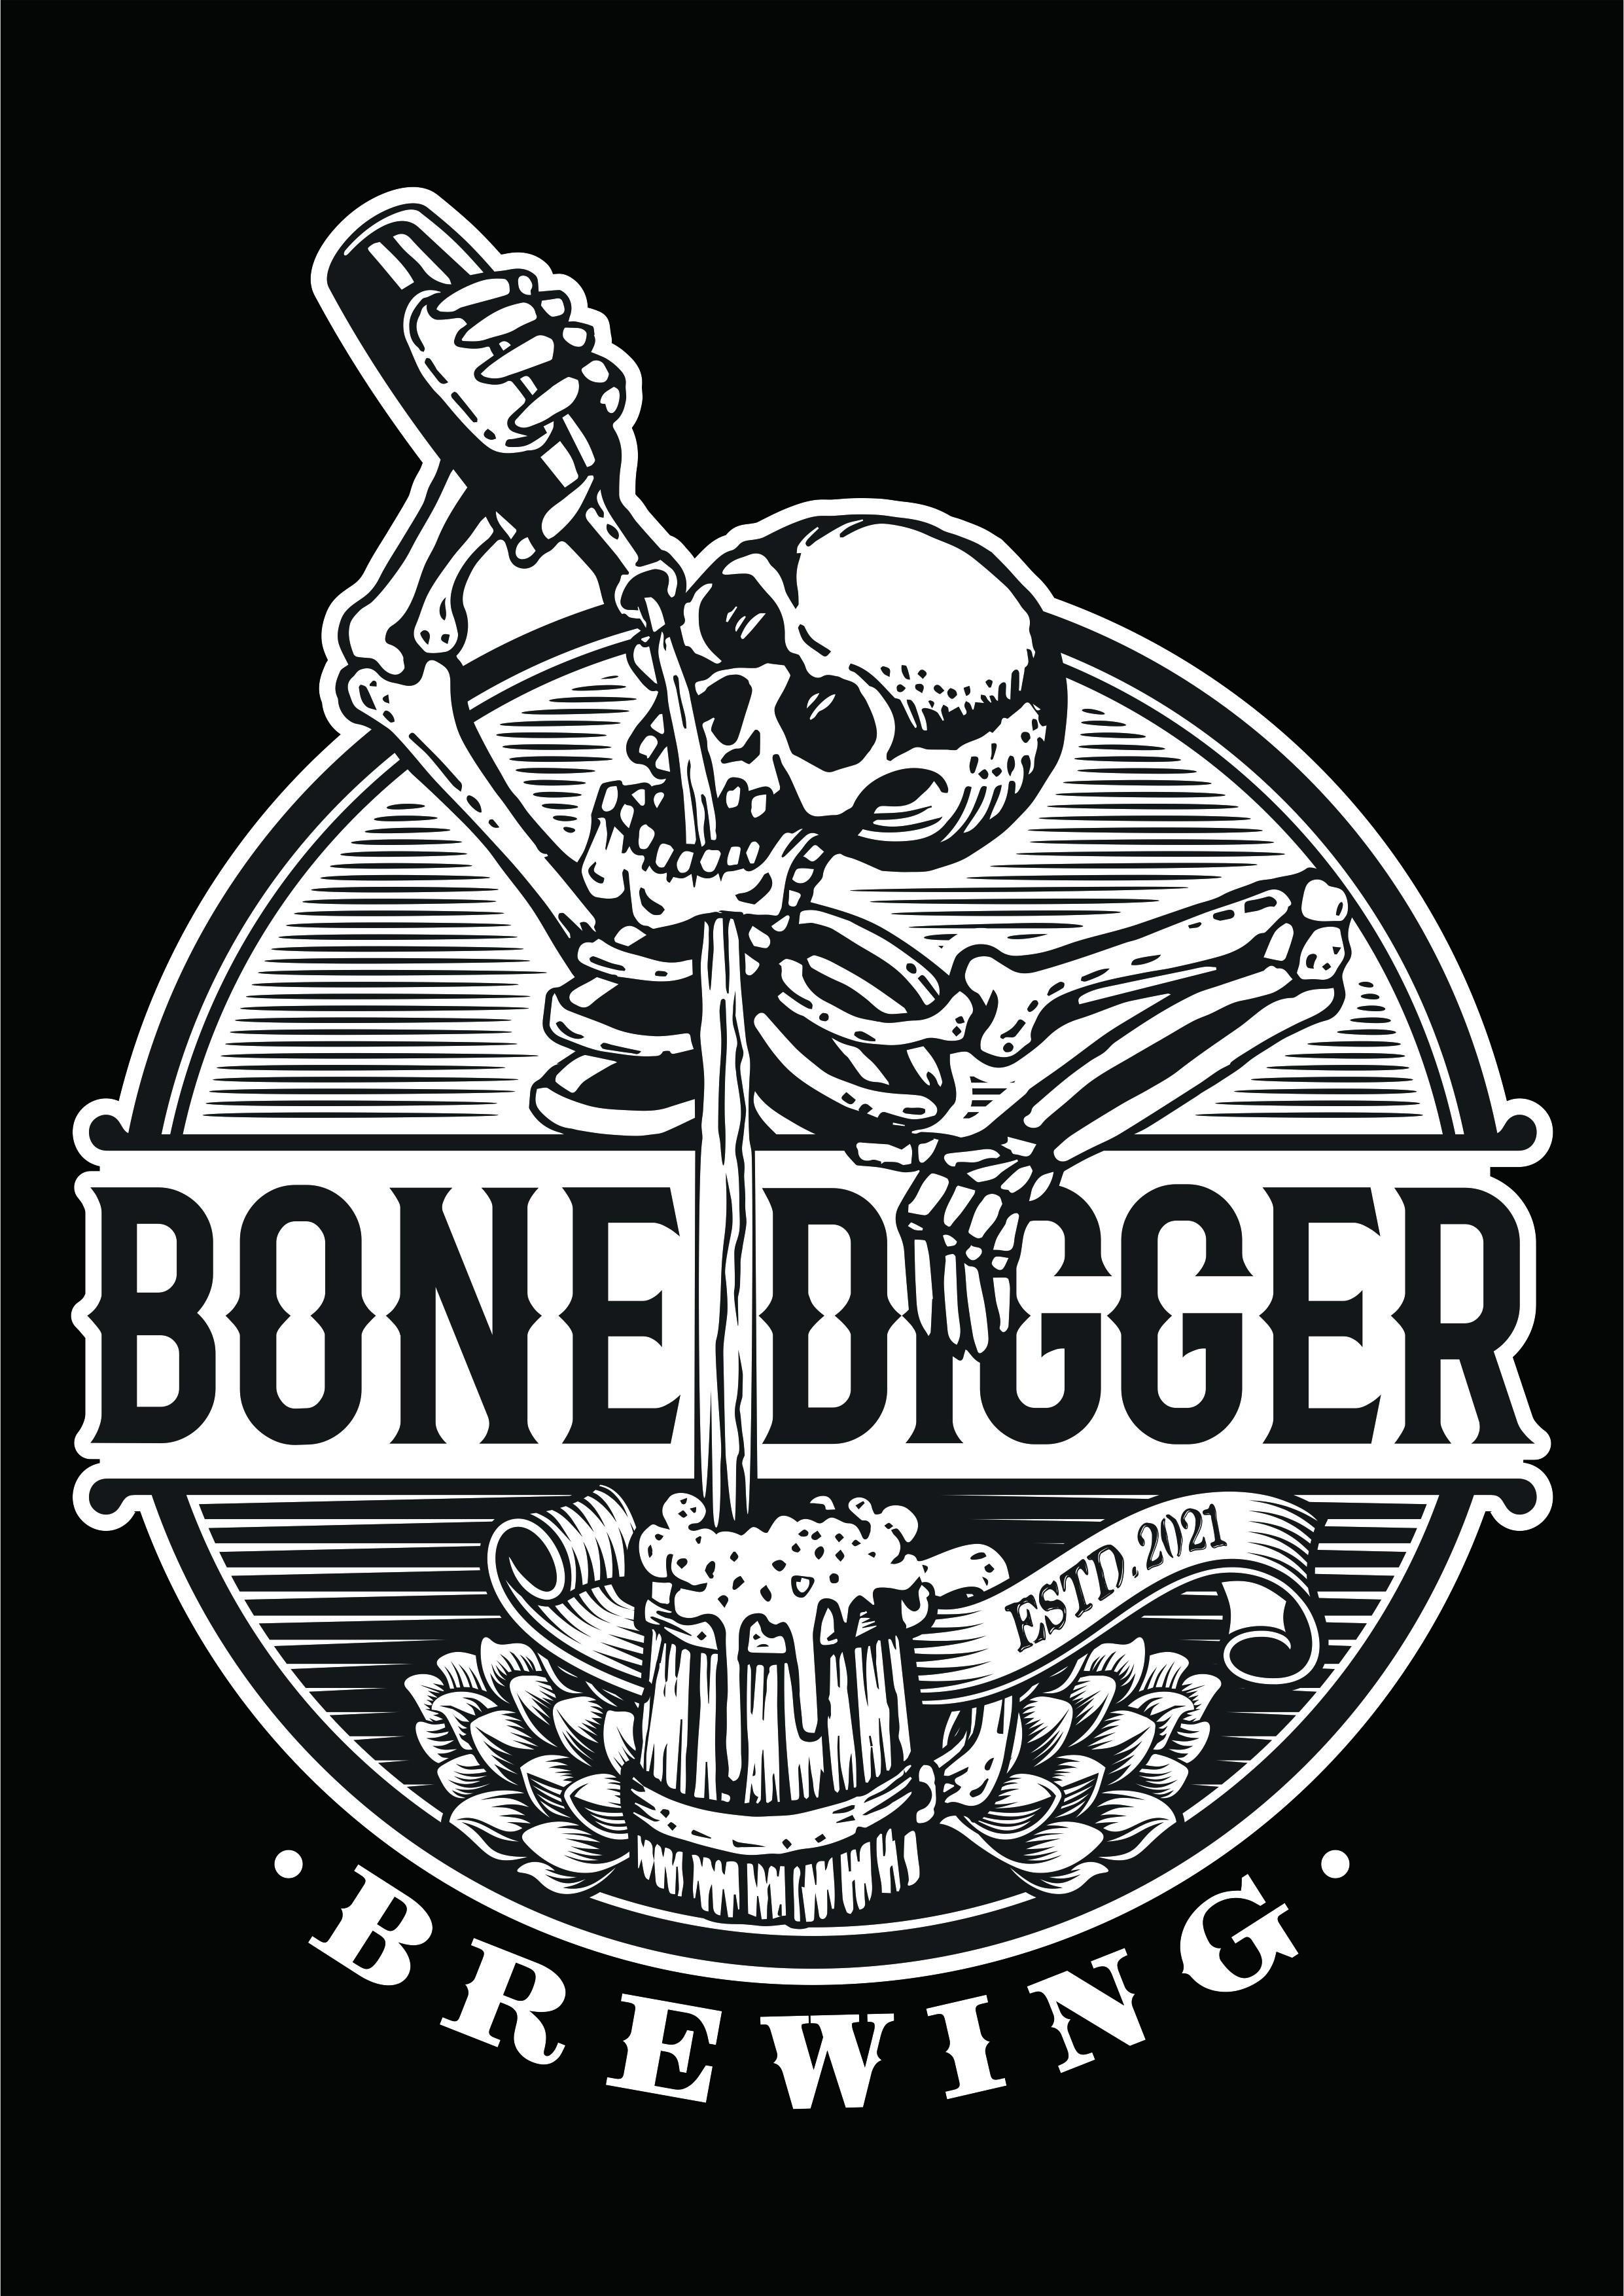 Bonedigger Brewery